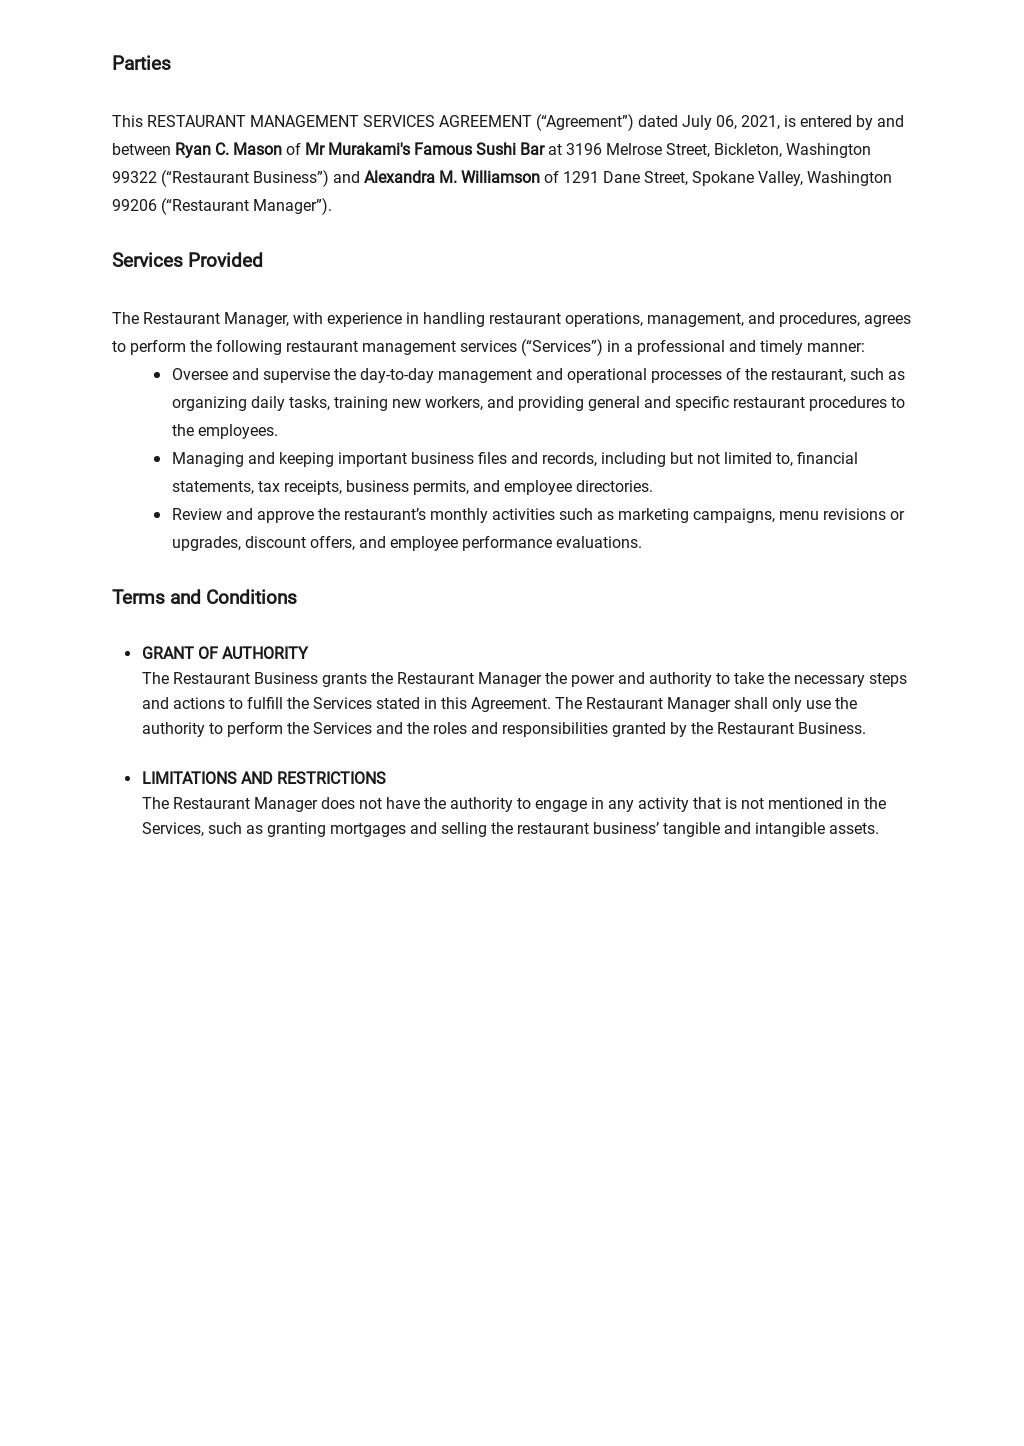 Restaurant Management Services Agreement Template 1.jpe